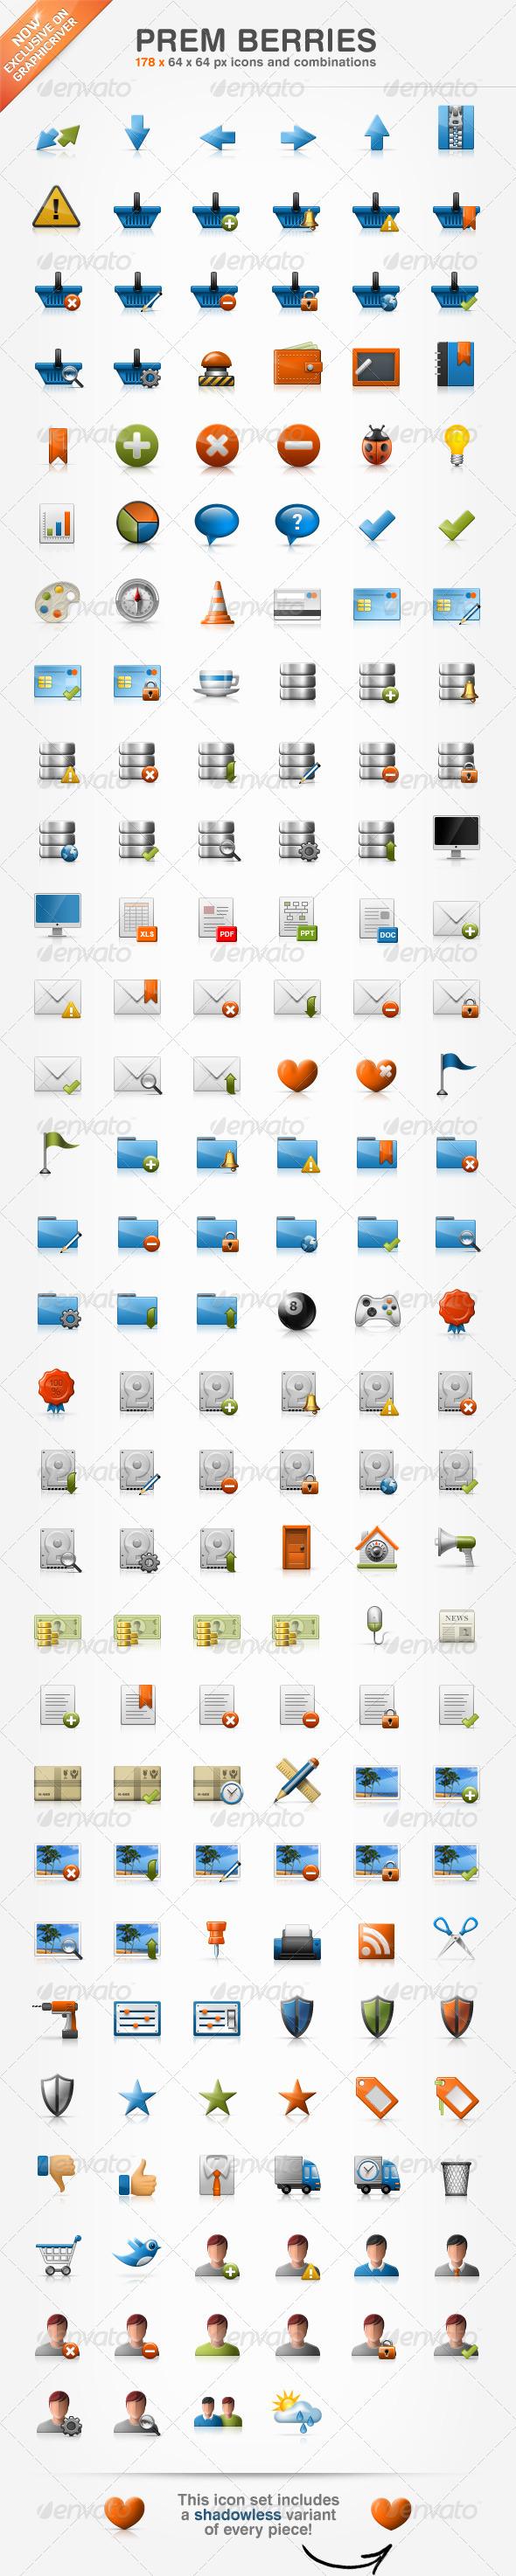 Prem Berries Set 178 Icons